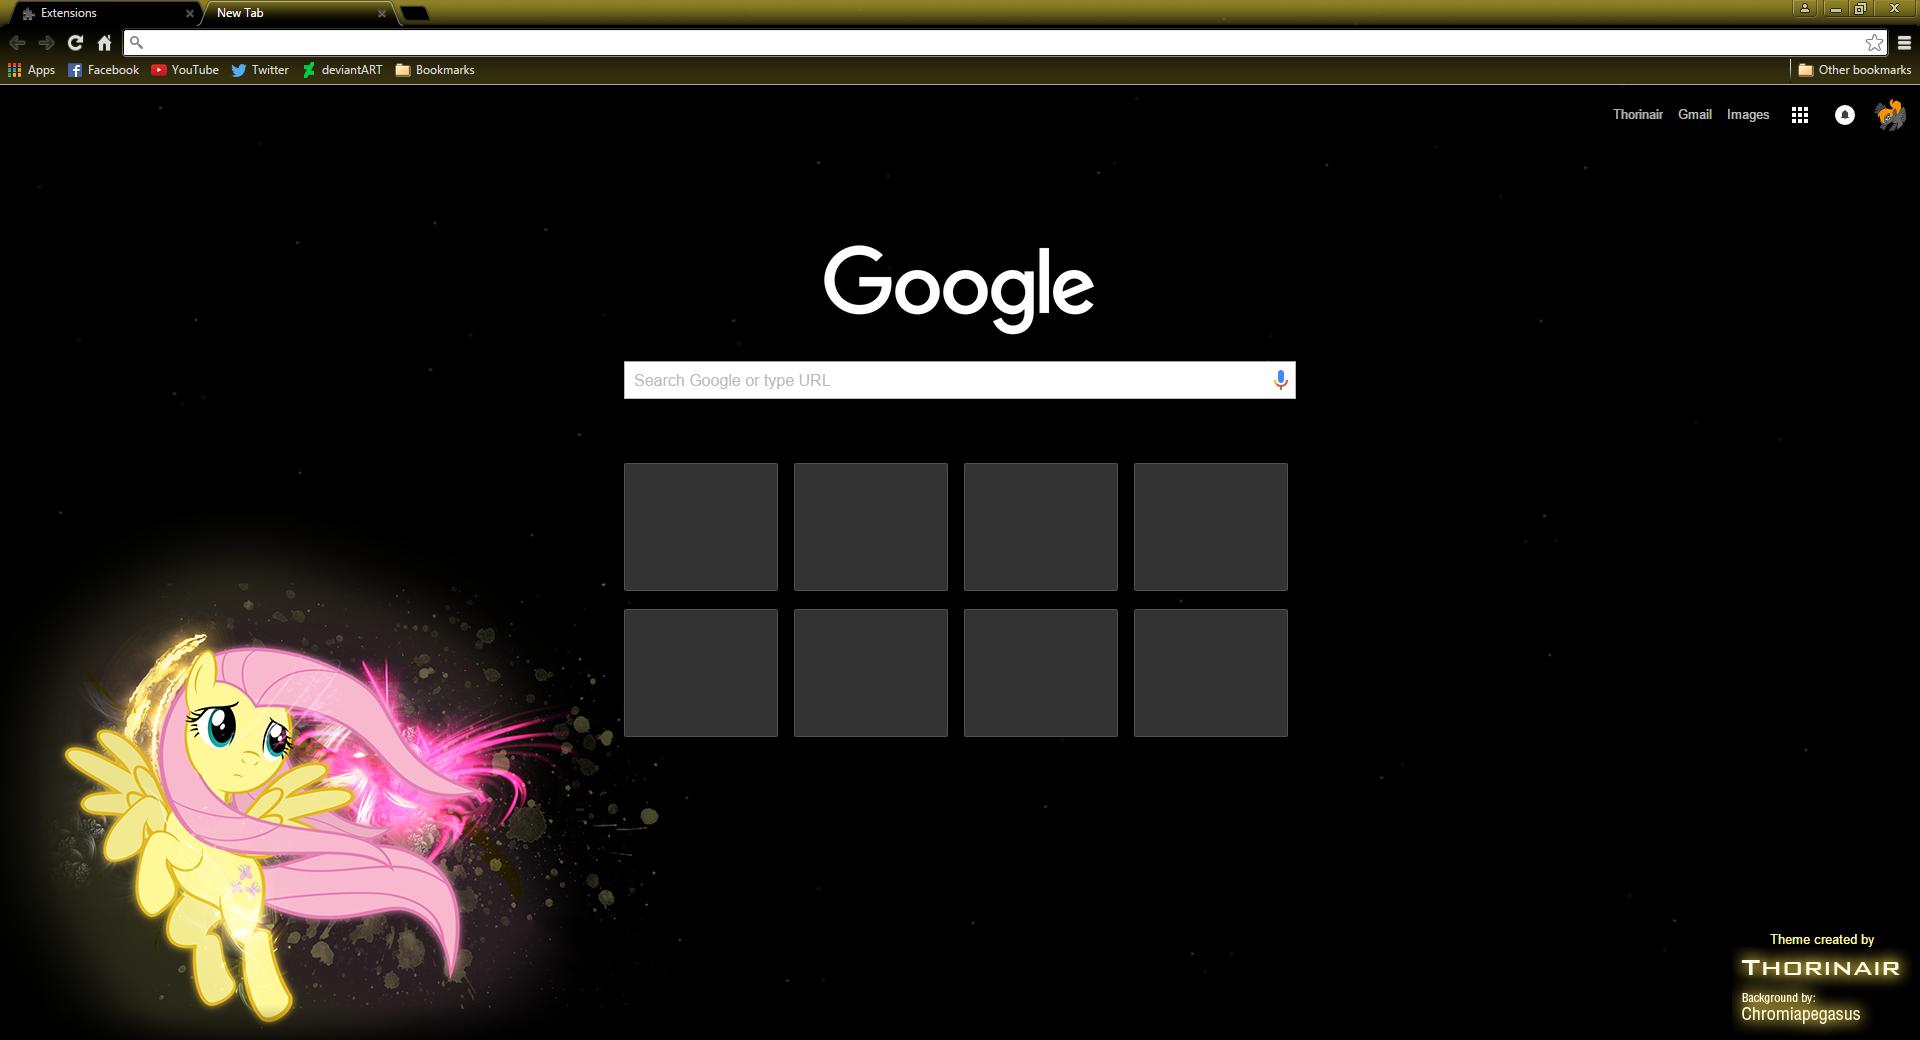 Fluttershy Google Chrome Theme by Thorinair